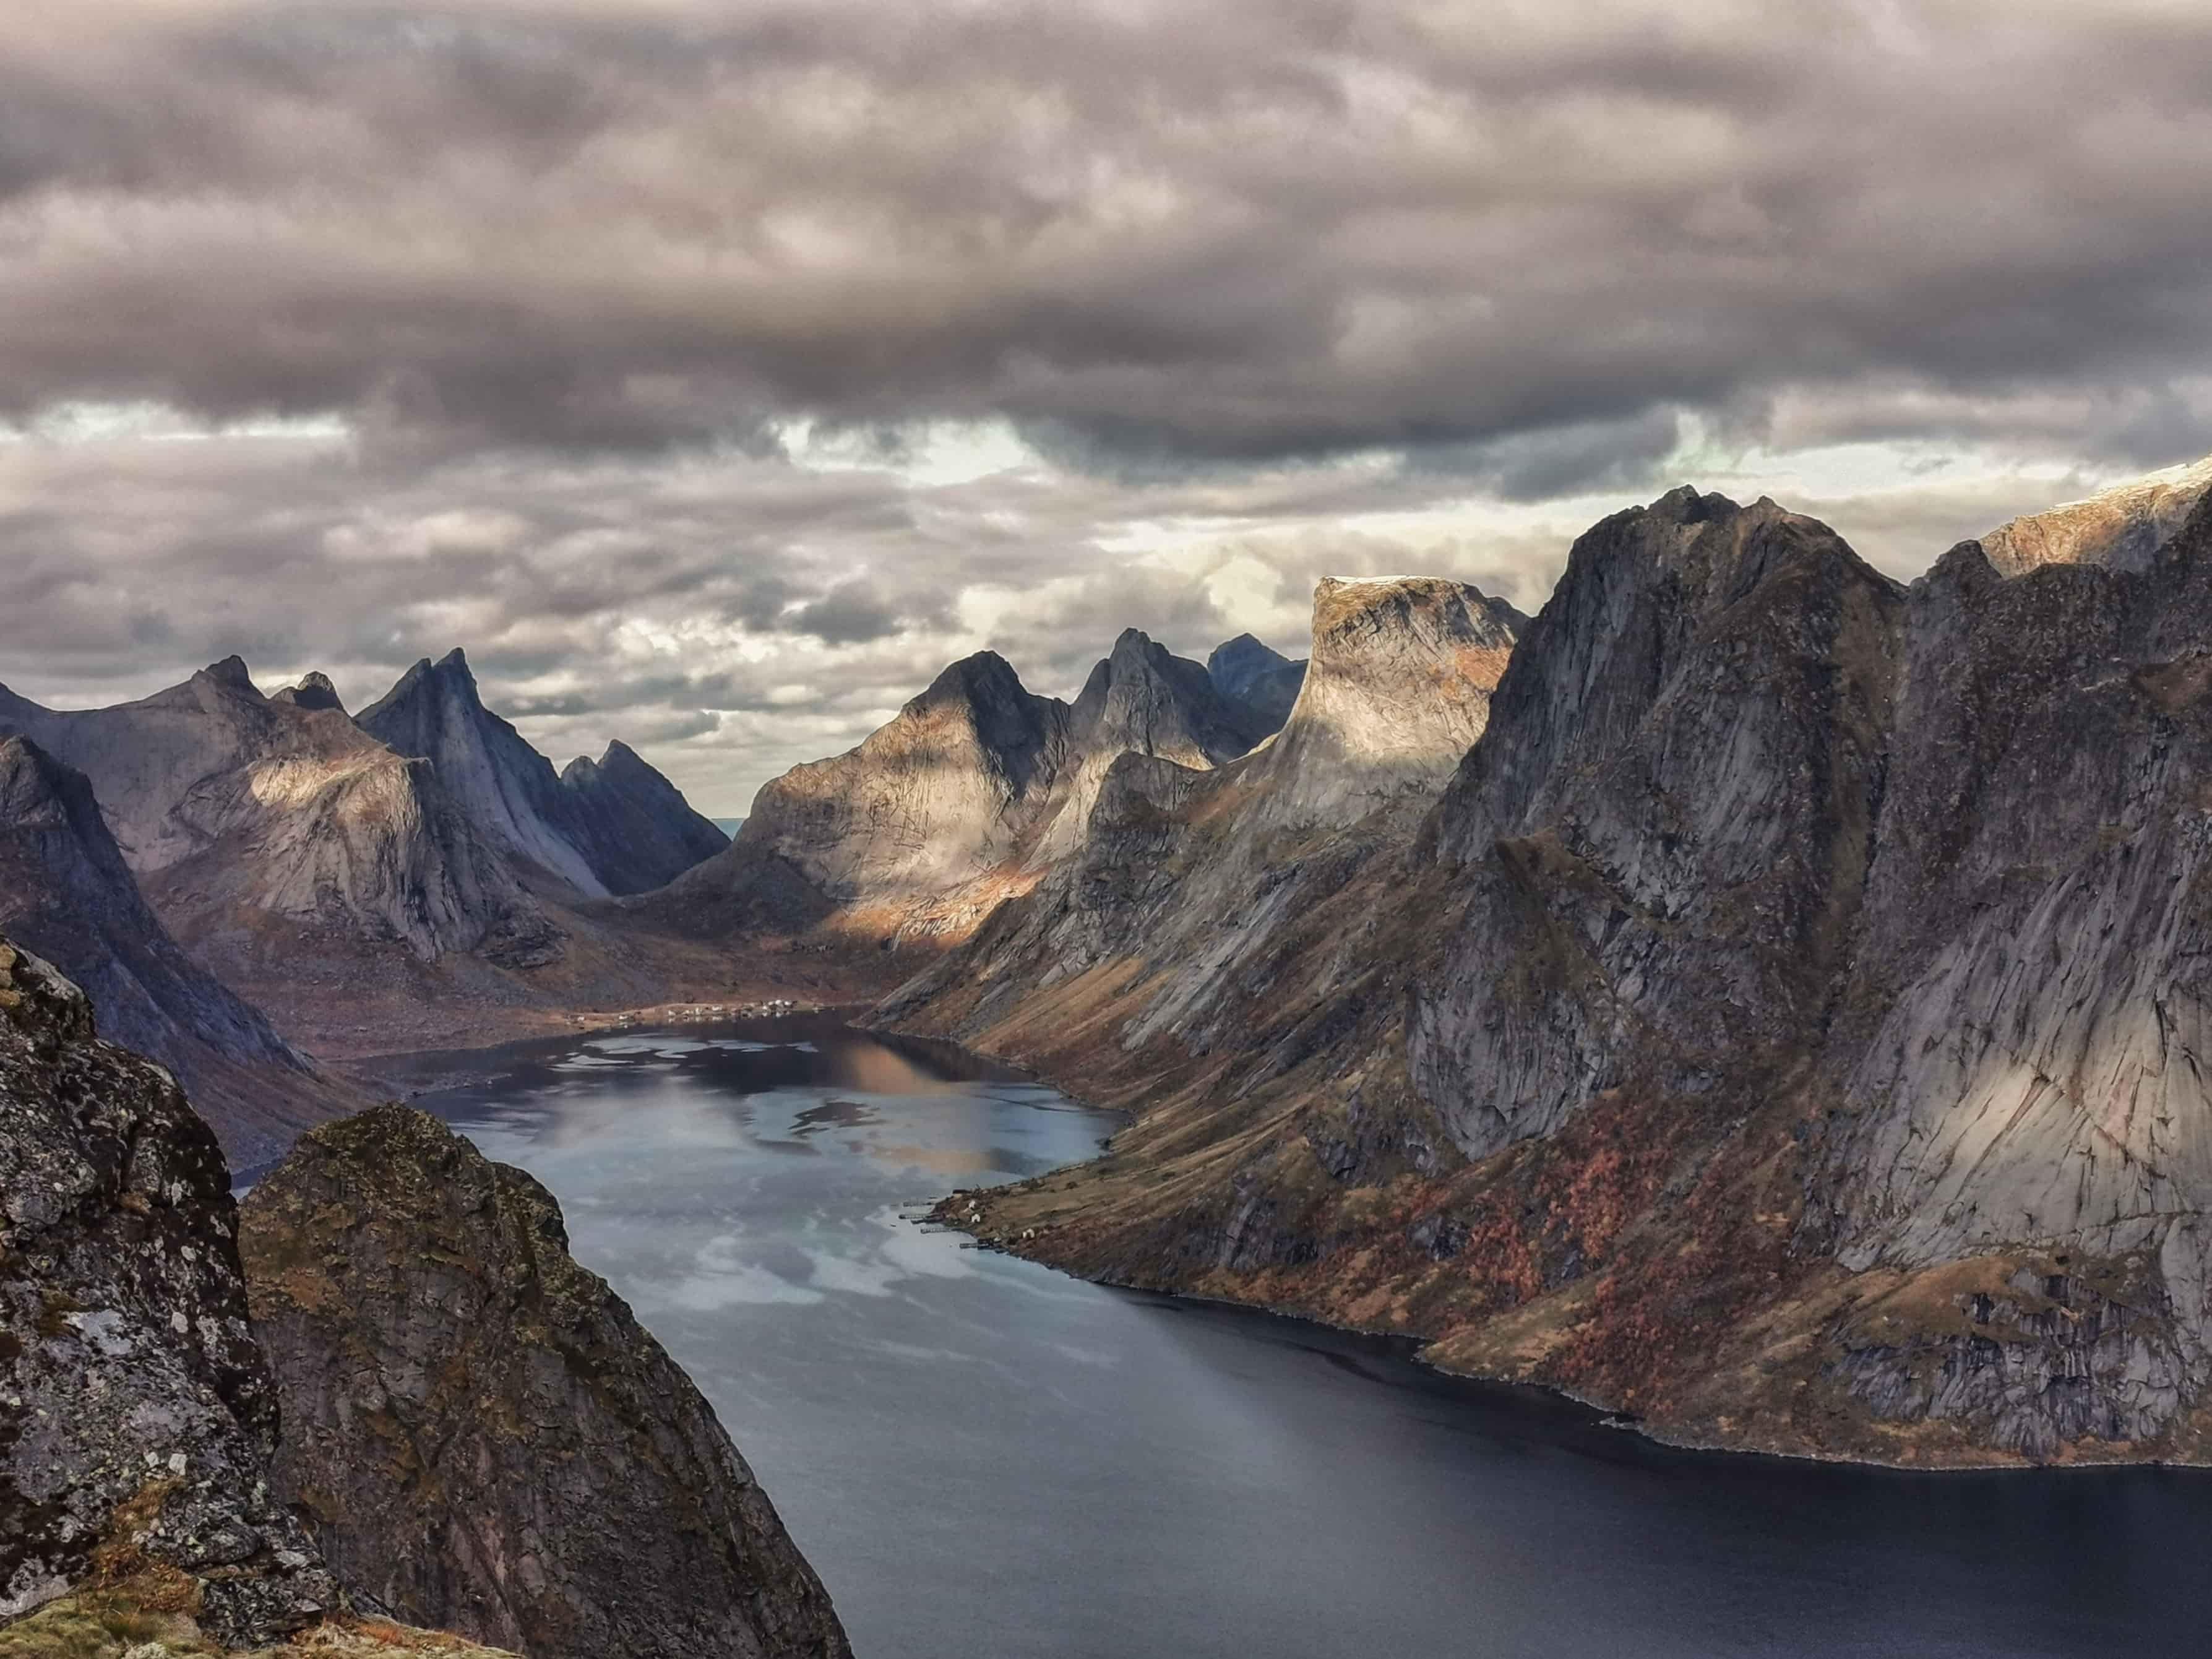 Mysterious Alpine lake